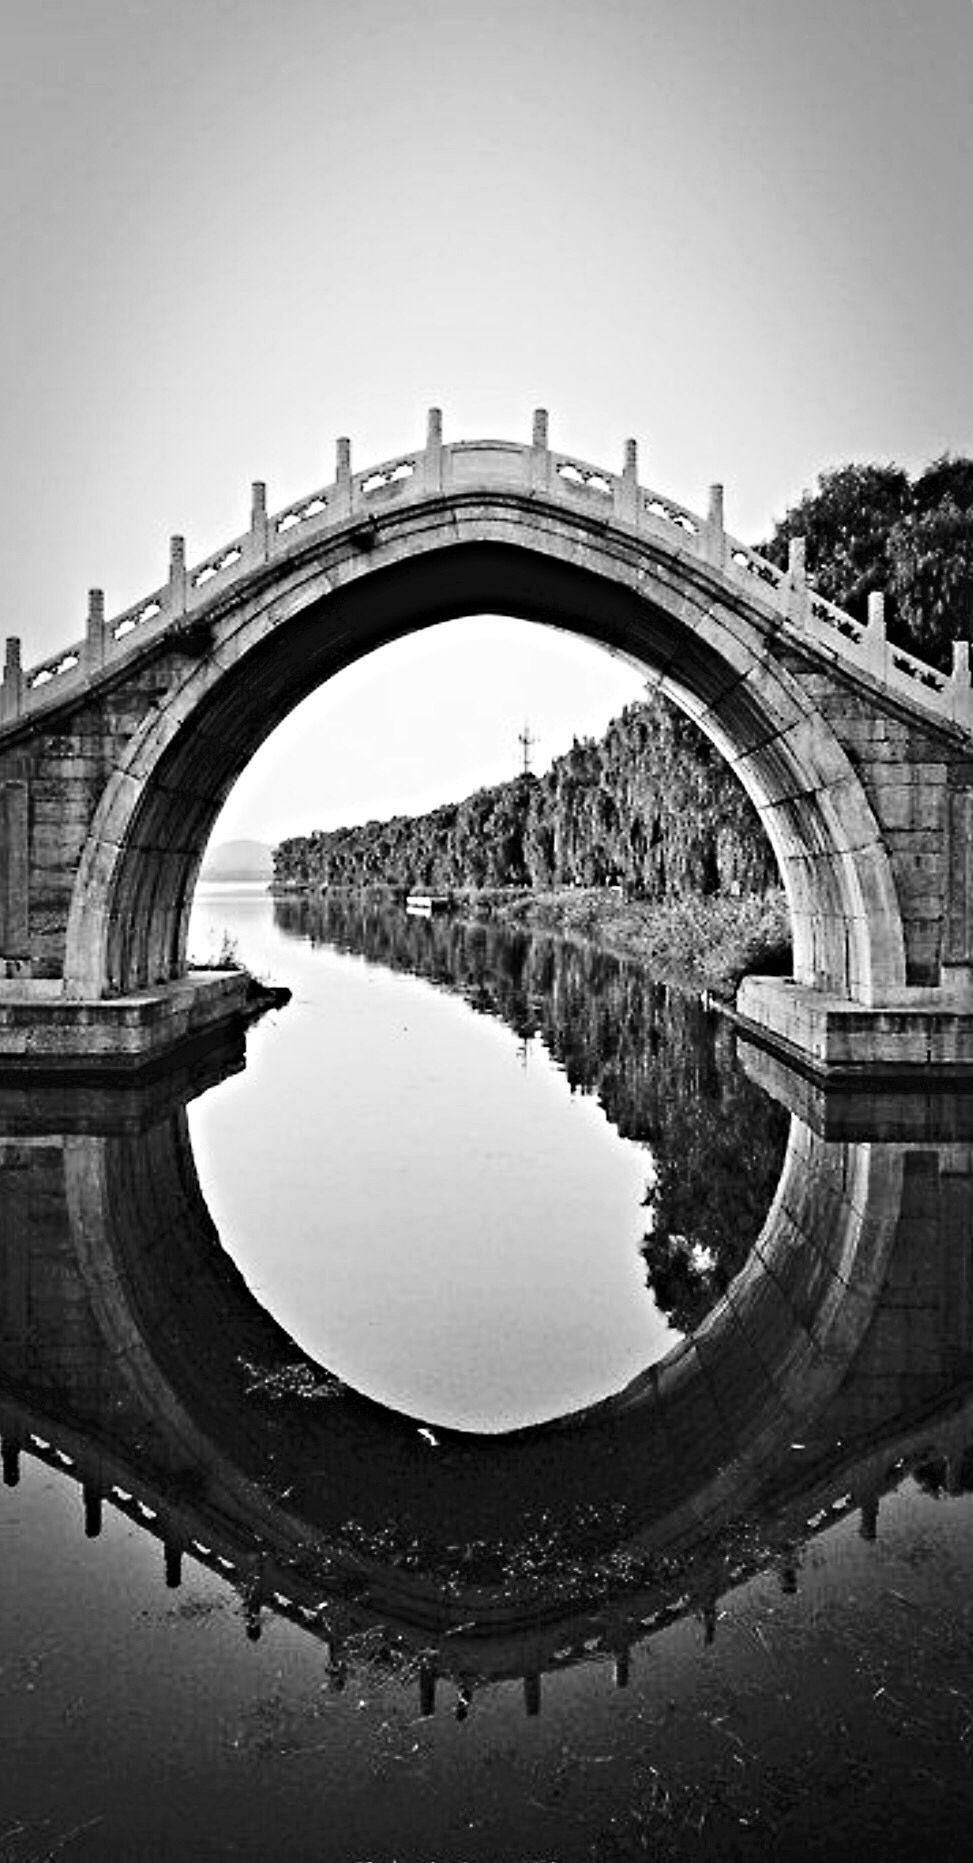 Bridge reflection in black and white